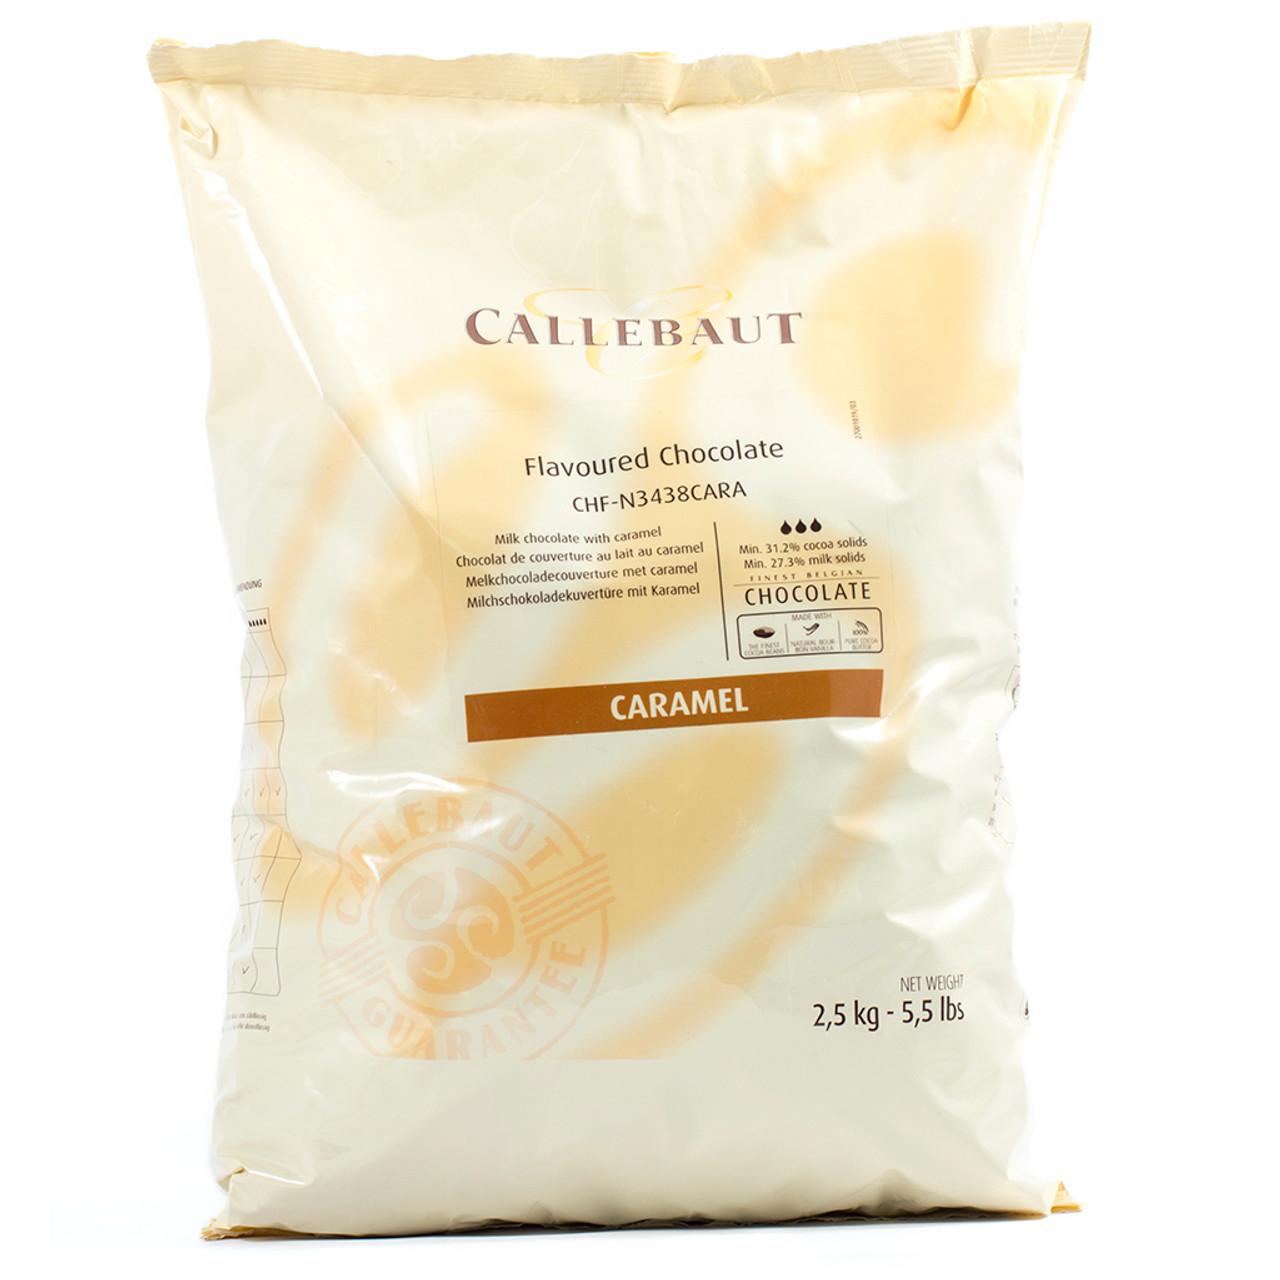 Chocolate Callets Callebaut Caramel